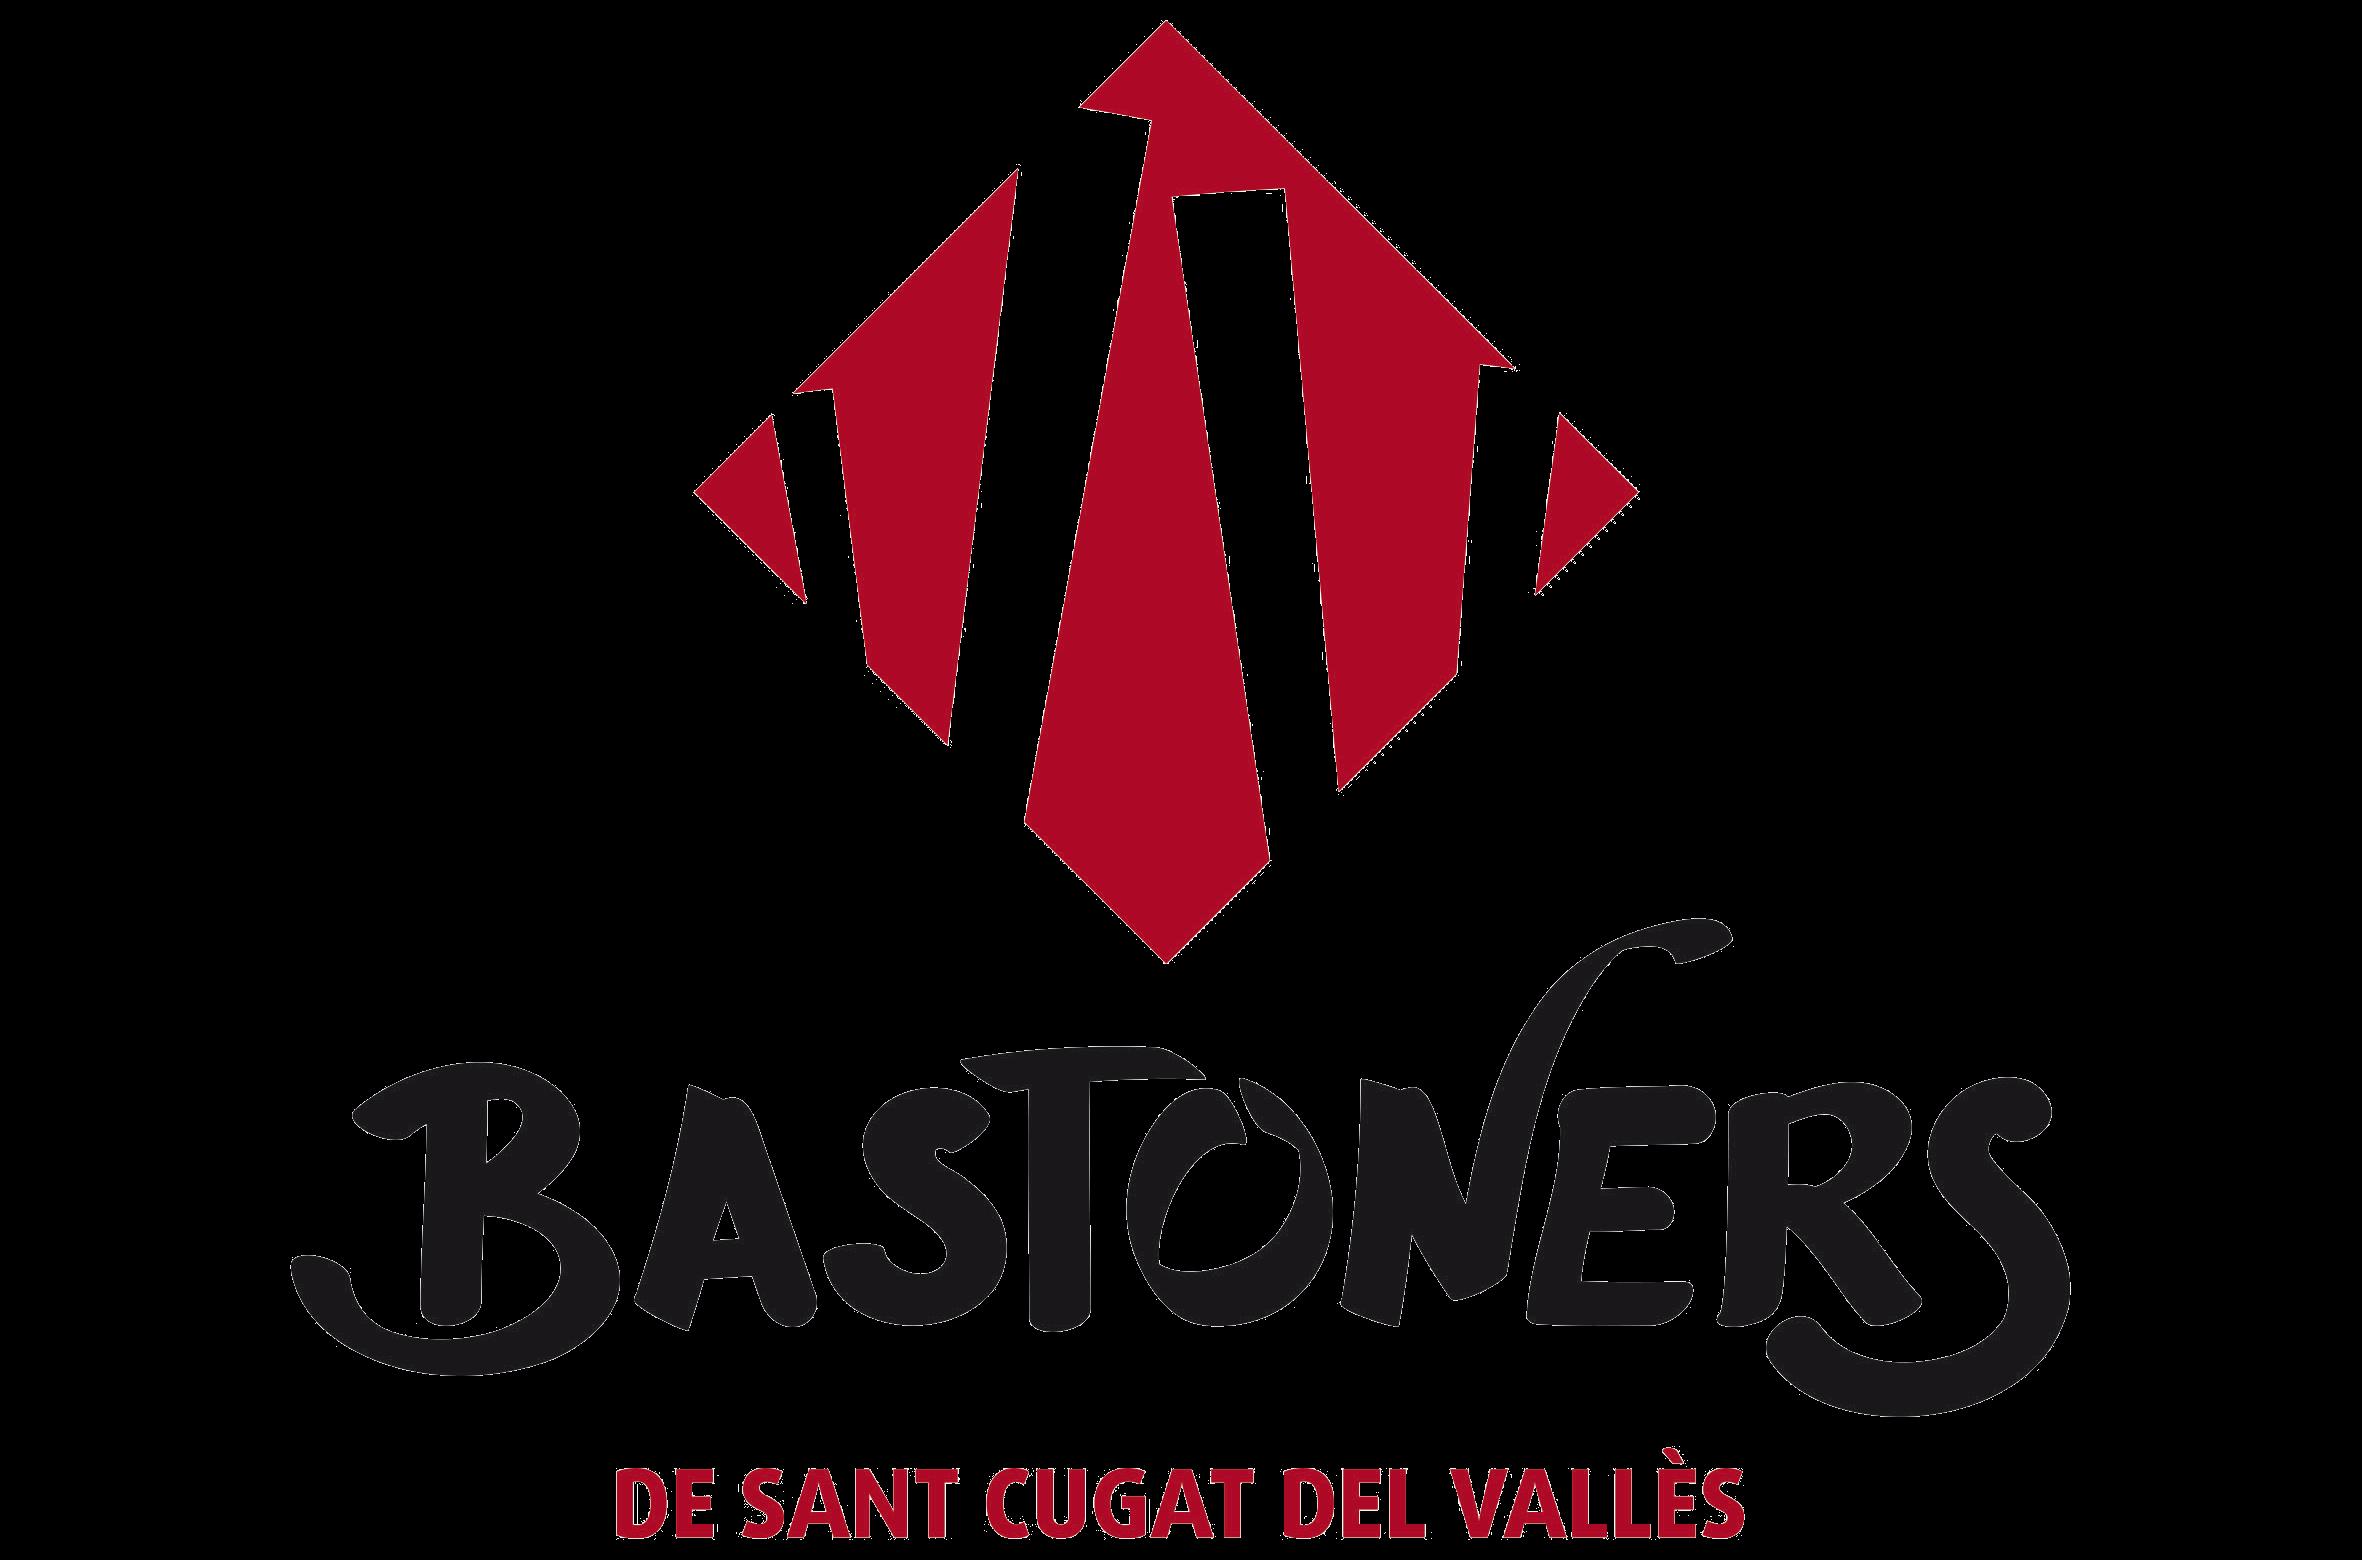 Bastoners de Sant Cugat